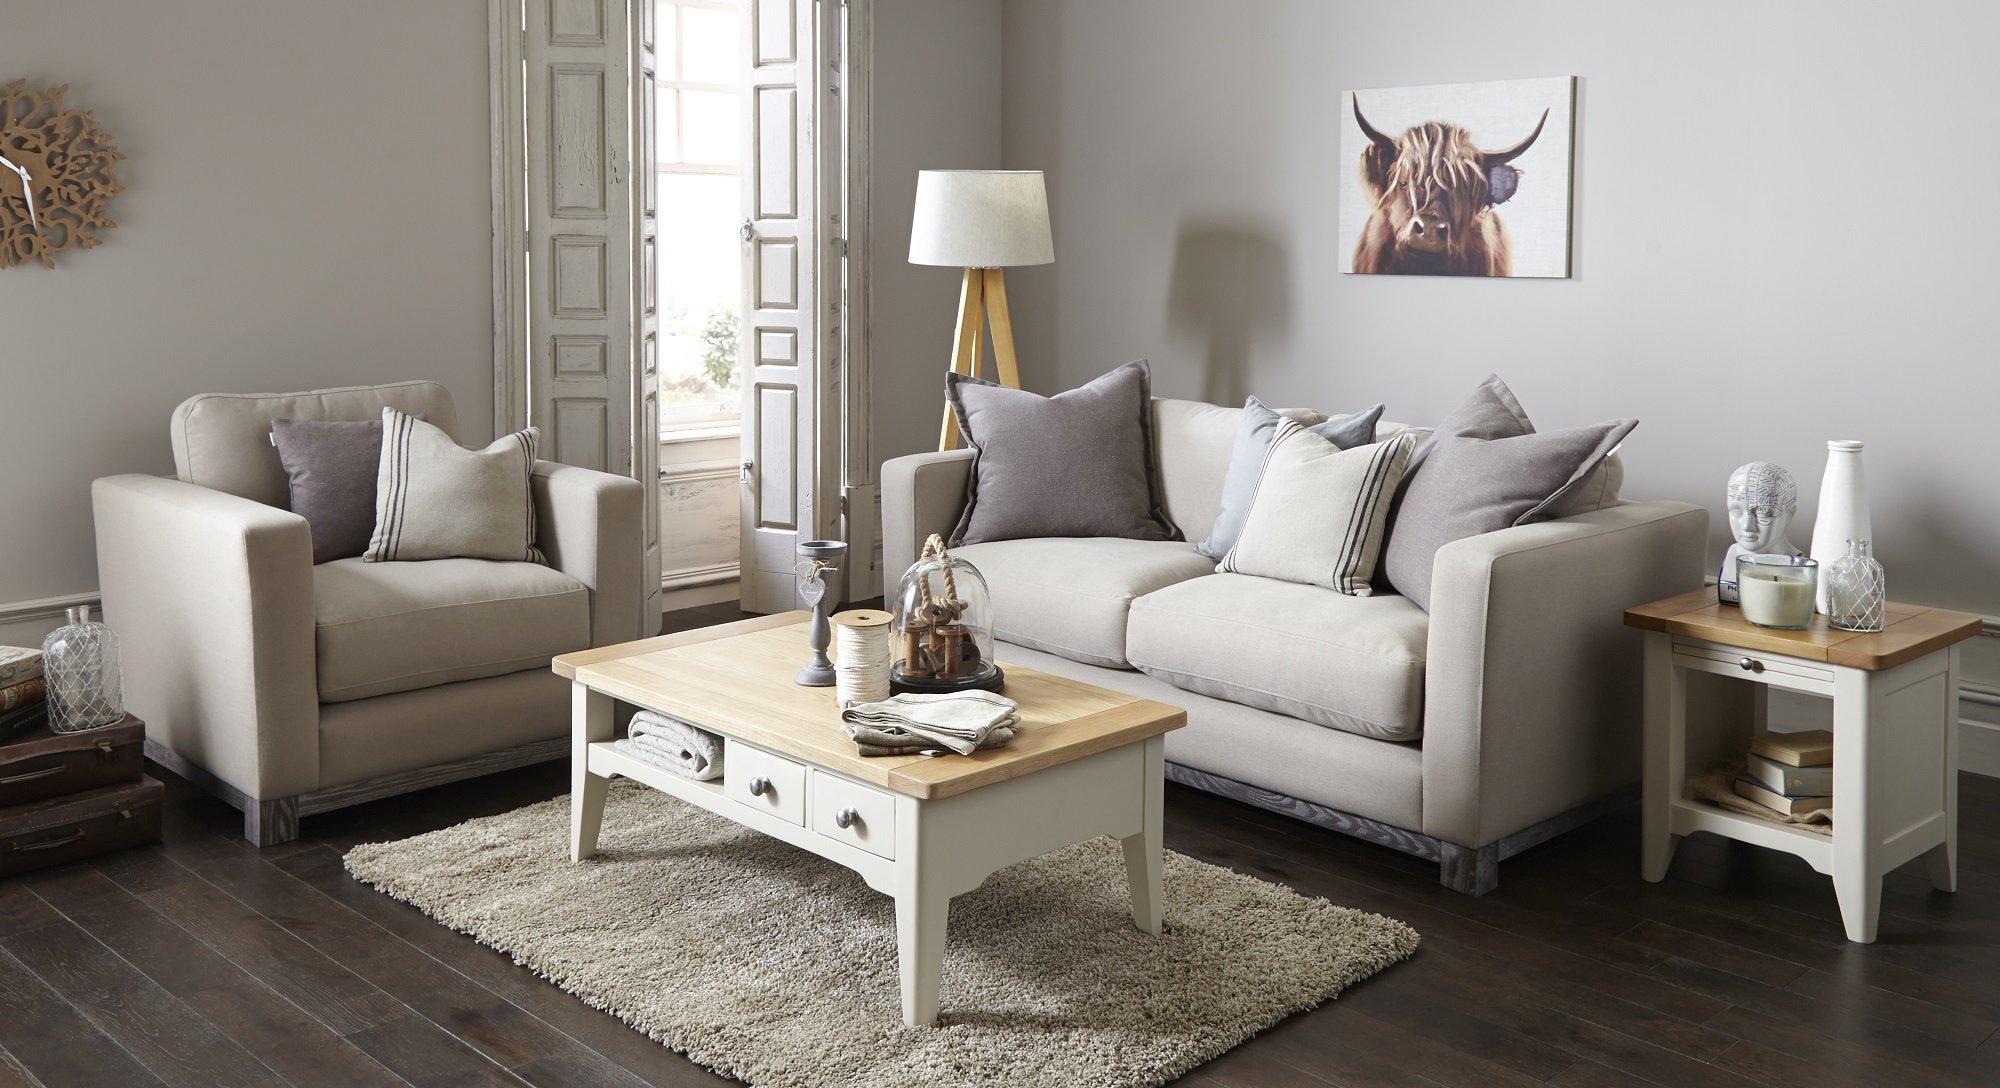 john lewis living room designs photo - 1